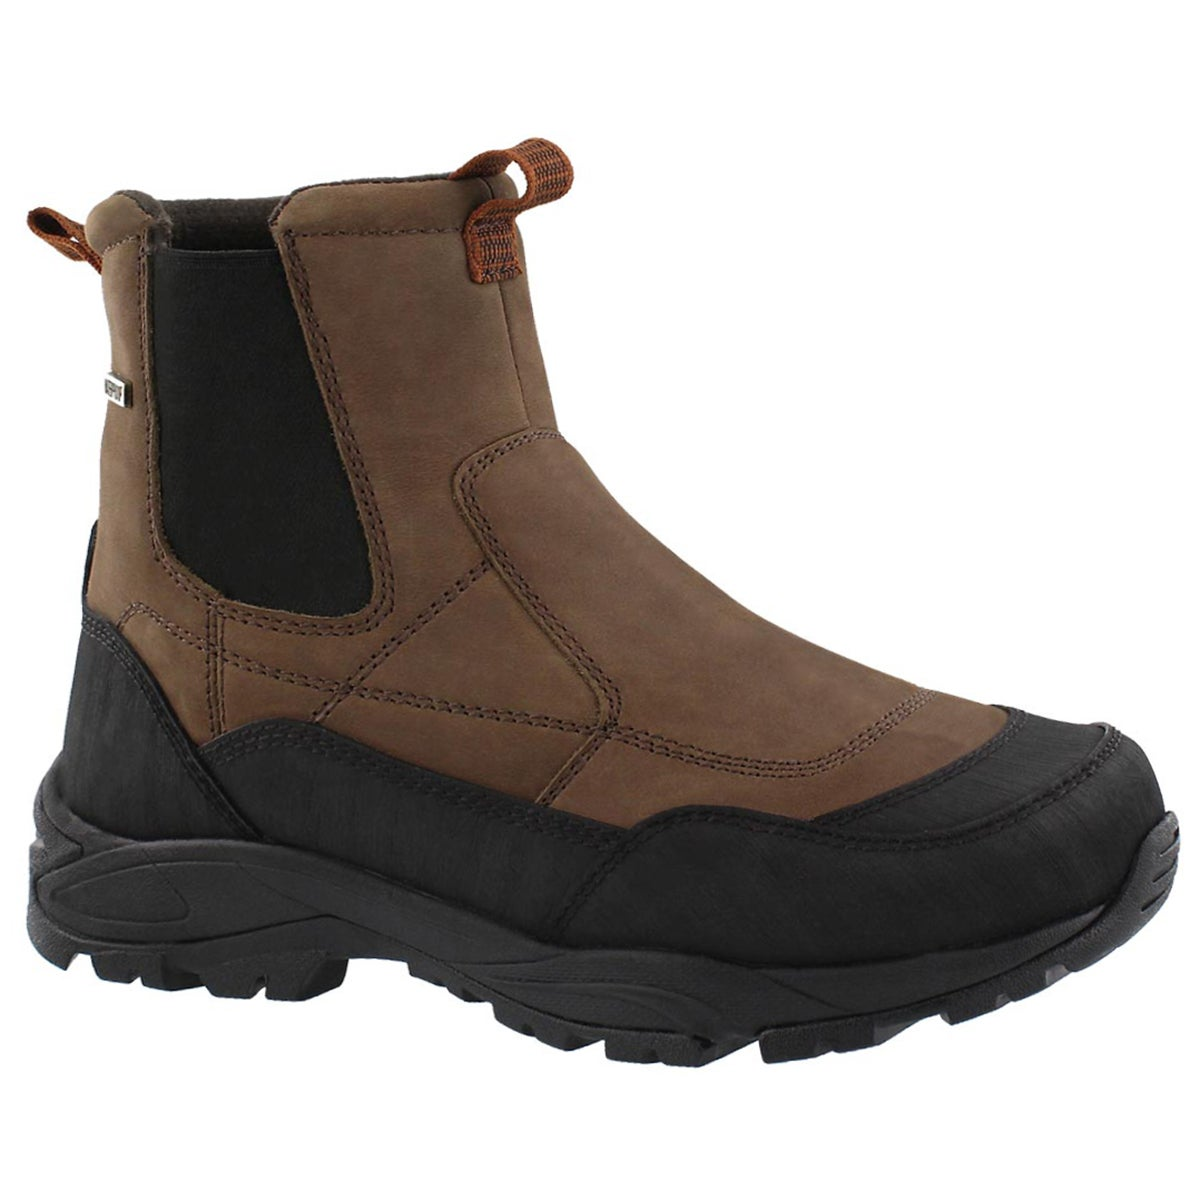 Men's MASON brown waterproof winter boots